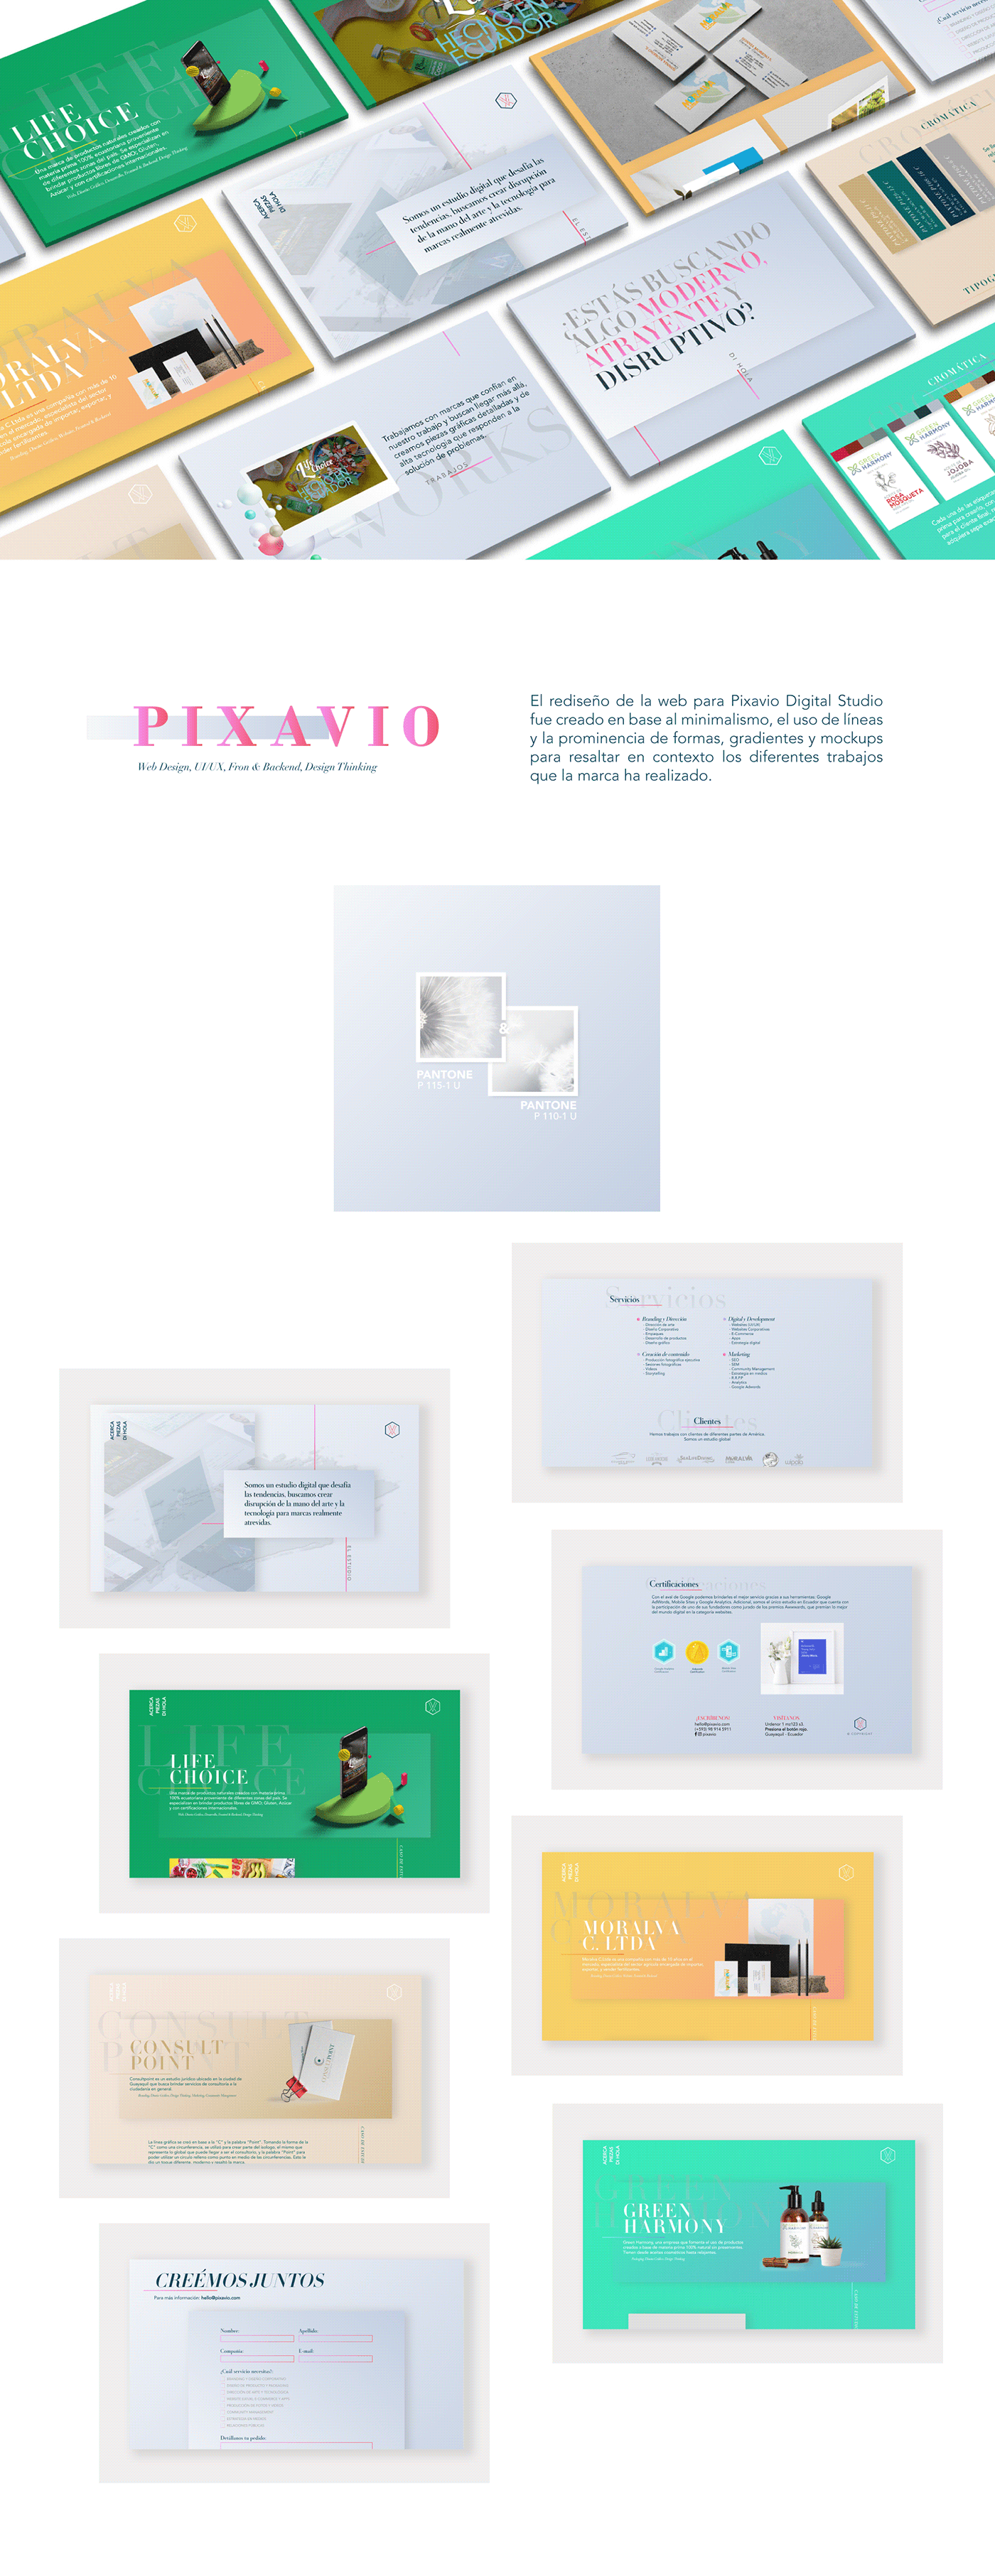 Website UI/UX devops design diseño graphic digital Responsive design thinking